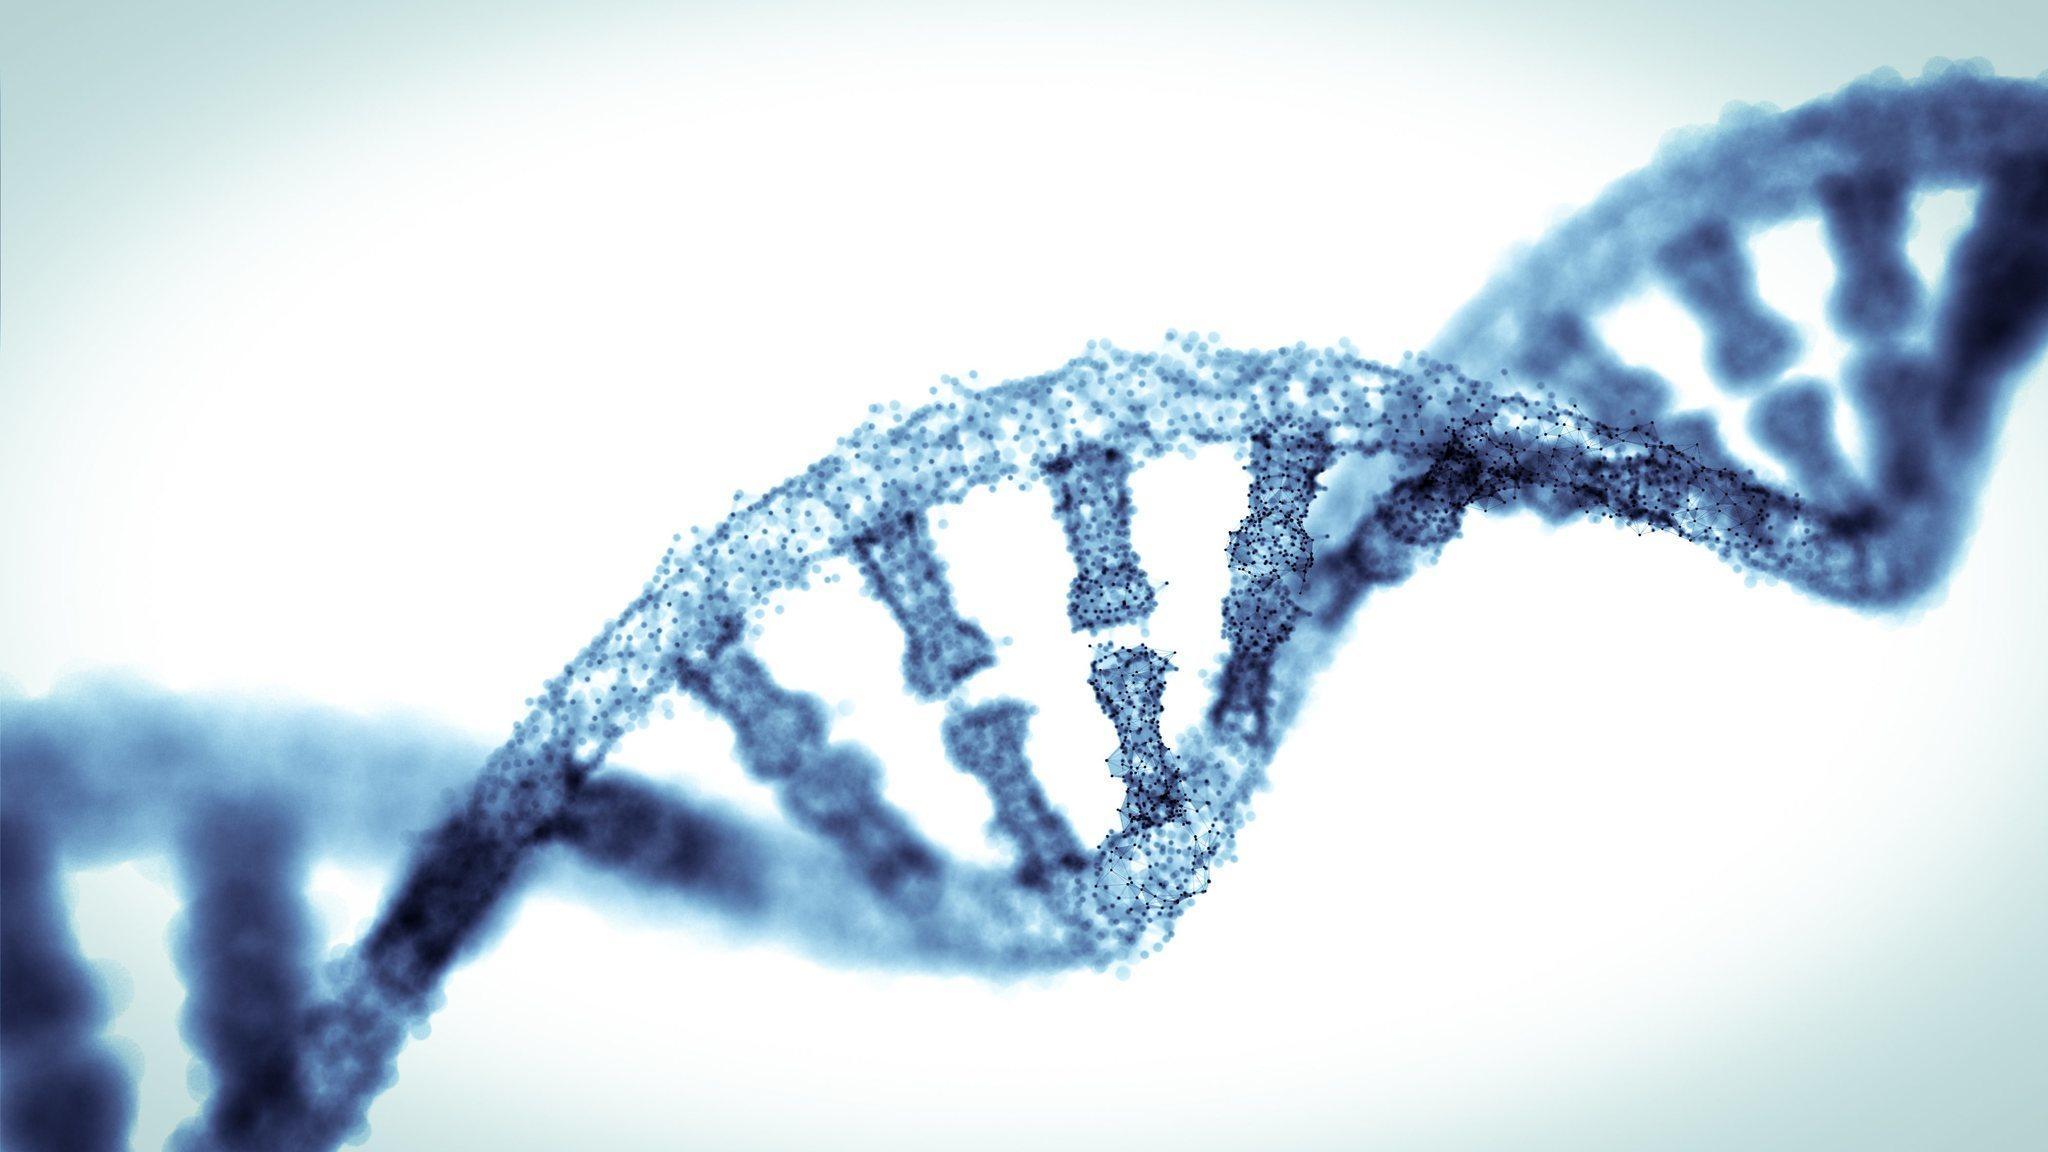 Метод очистки генома от ВИЧ опробовали на грызунах